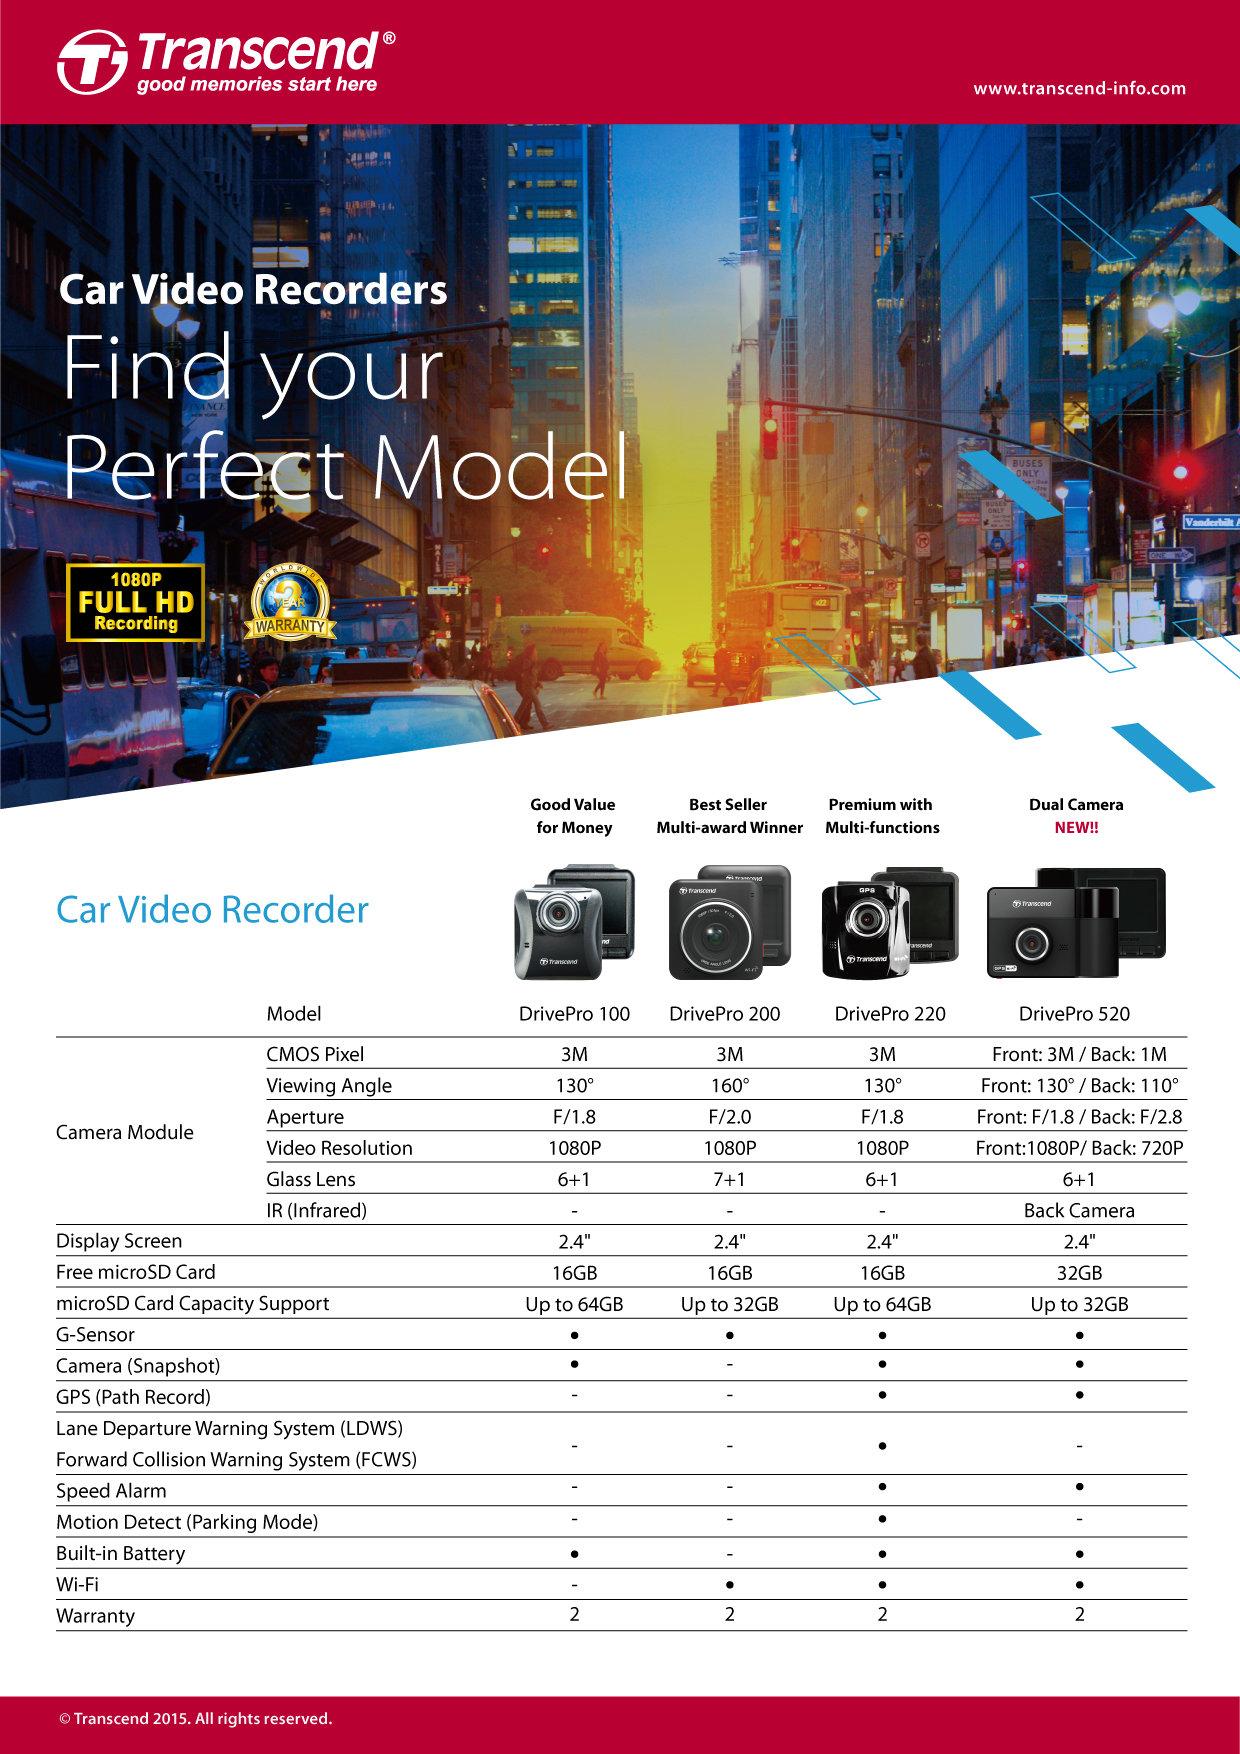 Transcend DrivePro dashcam comparison